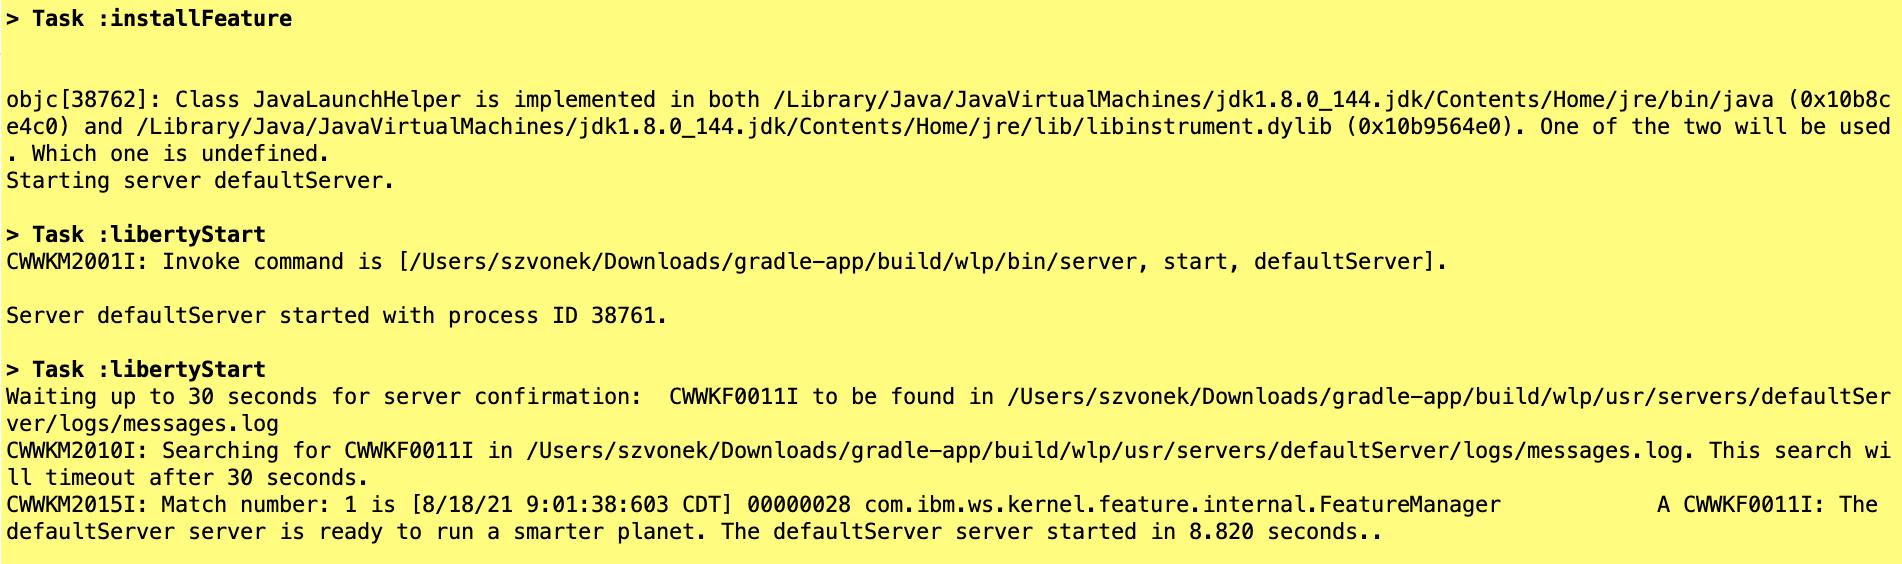 screen capture of the starter gradlew libertyStart output